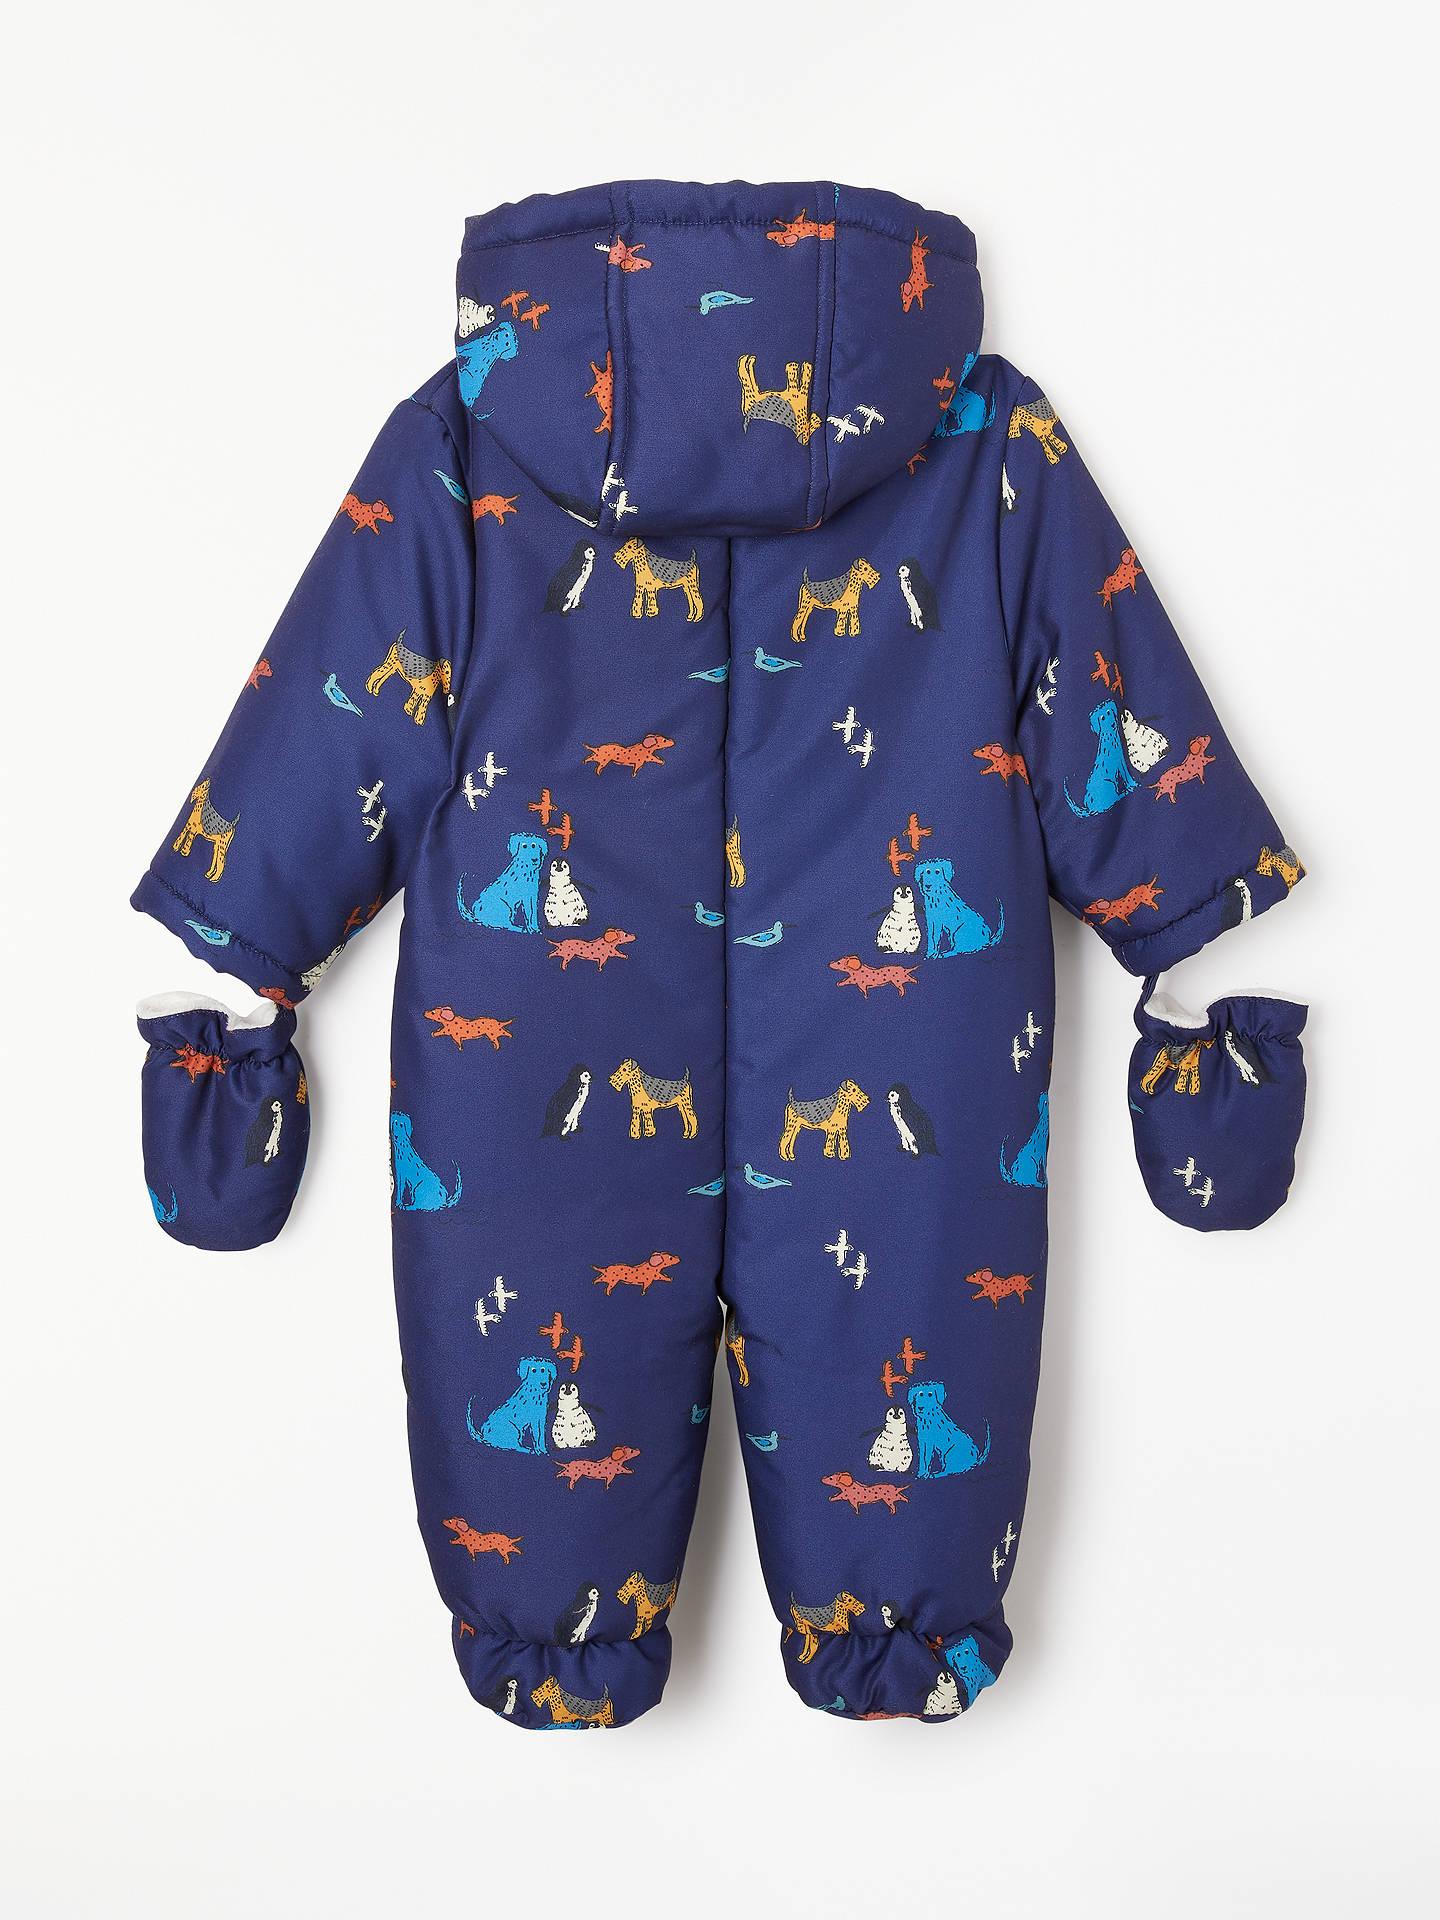 ef0676555 ... Buy John Lewis & Partners Baby Isle Of Dogs Snowsuit, Navy, Newborn  Online at ...